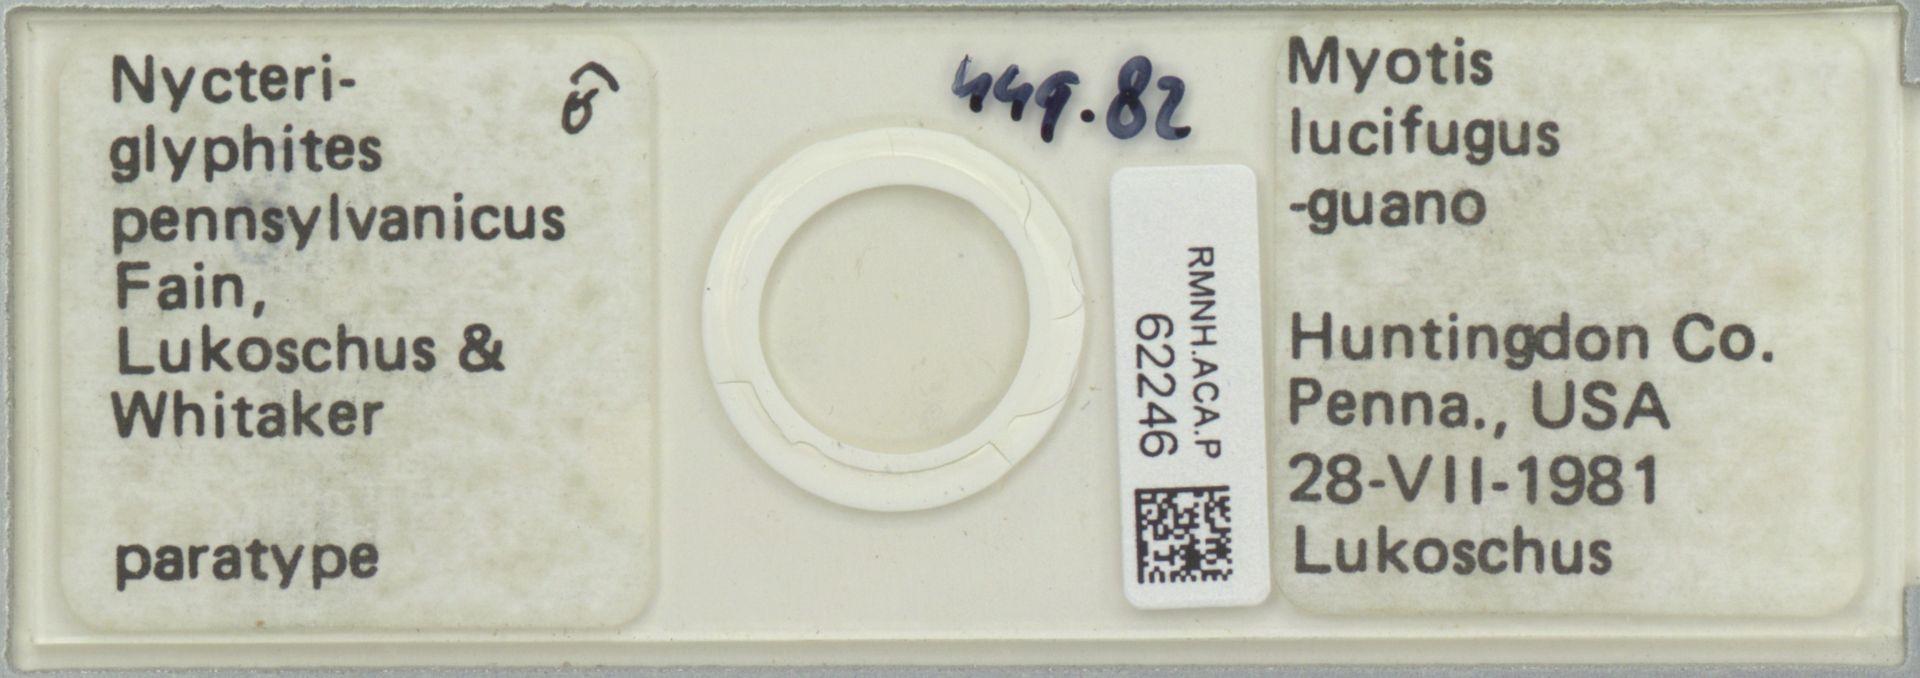 RMNH.ACA.P.62246 | Nycteriglyphites pennsylvanicus Fain, Lukoschus & Whitaker